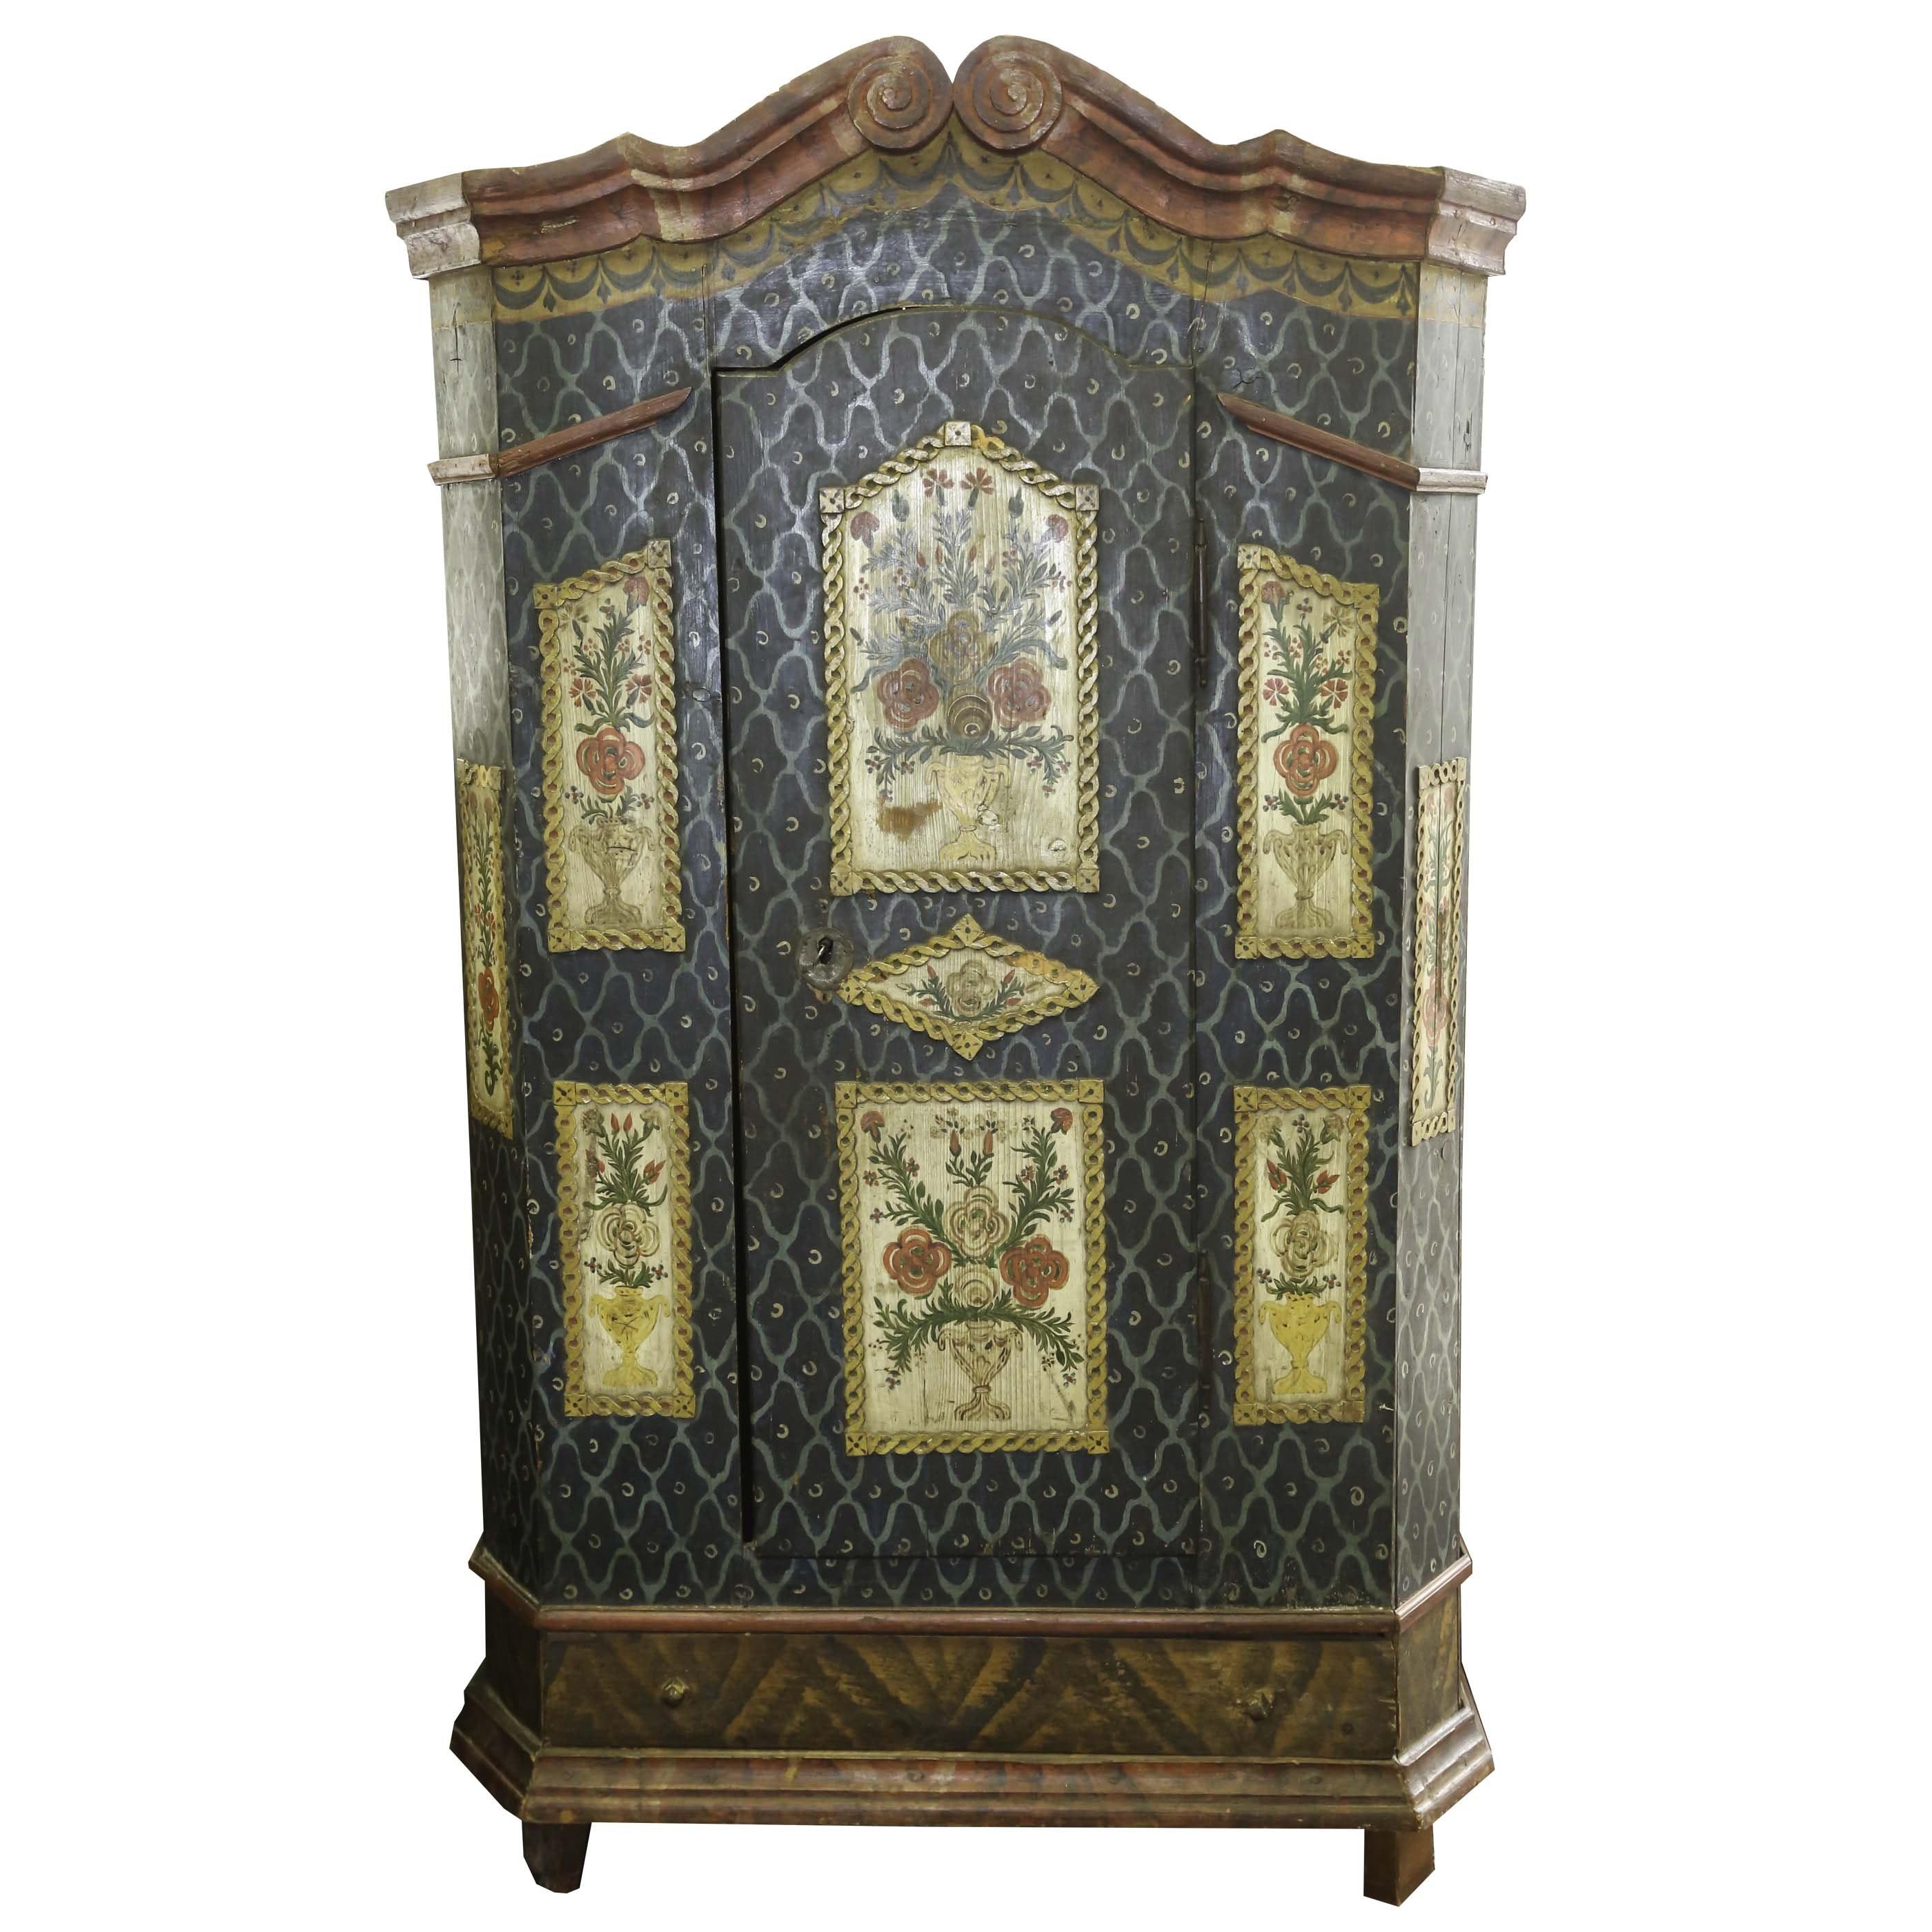 Circa 1850 Antique Austrian Paint Decorated Wardrobe